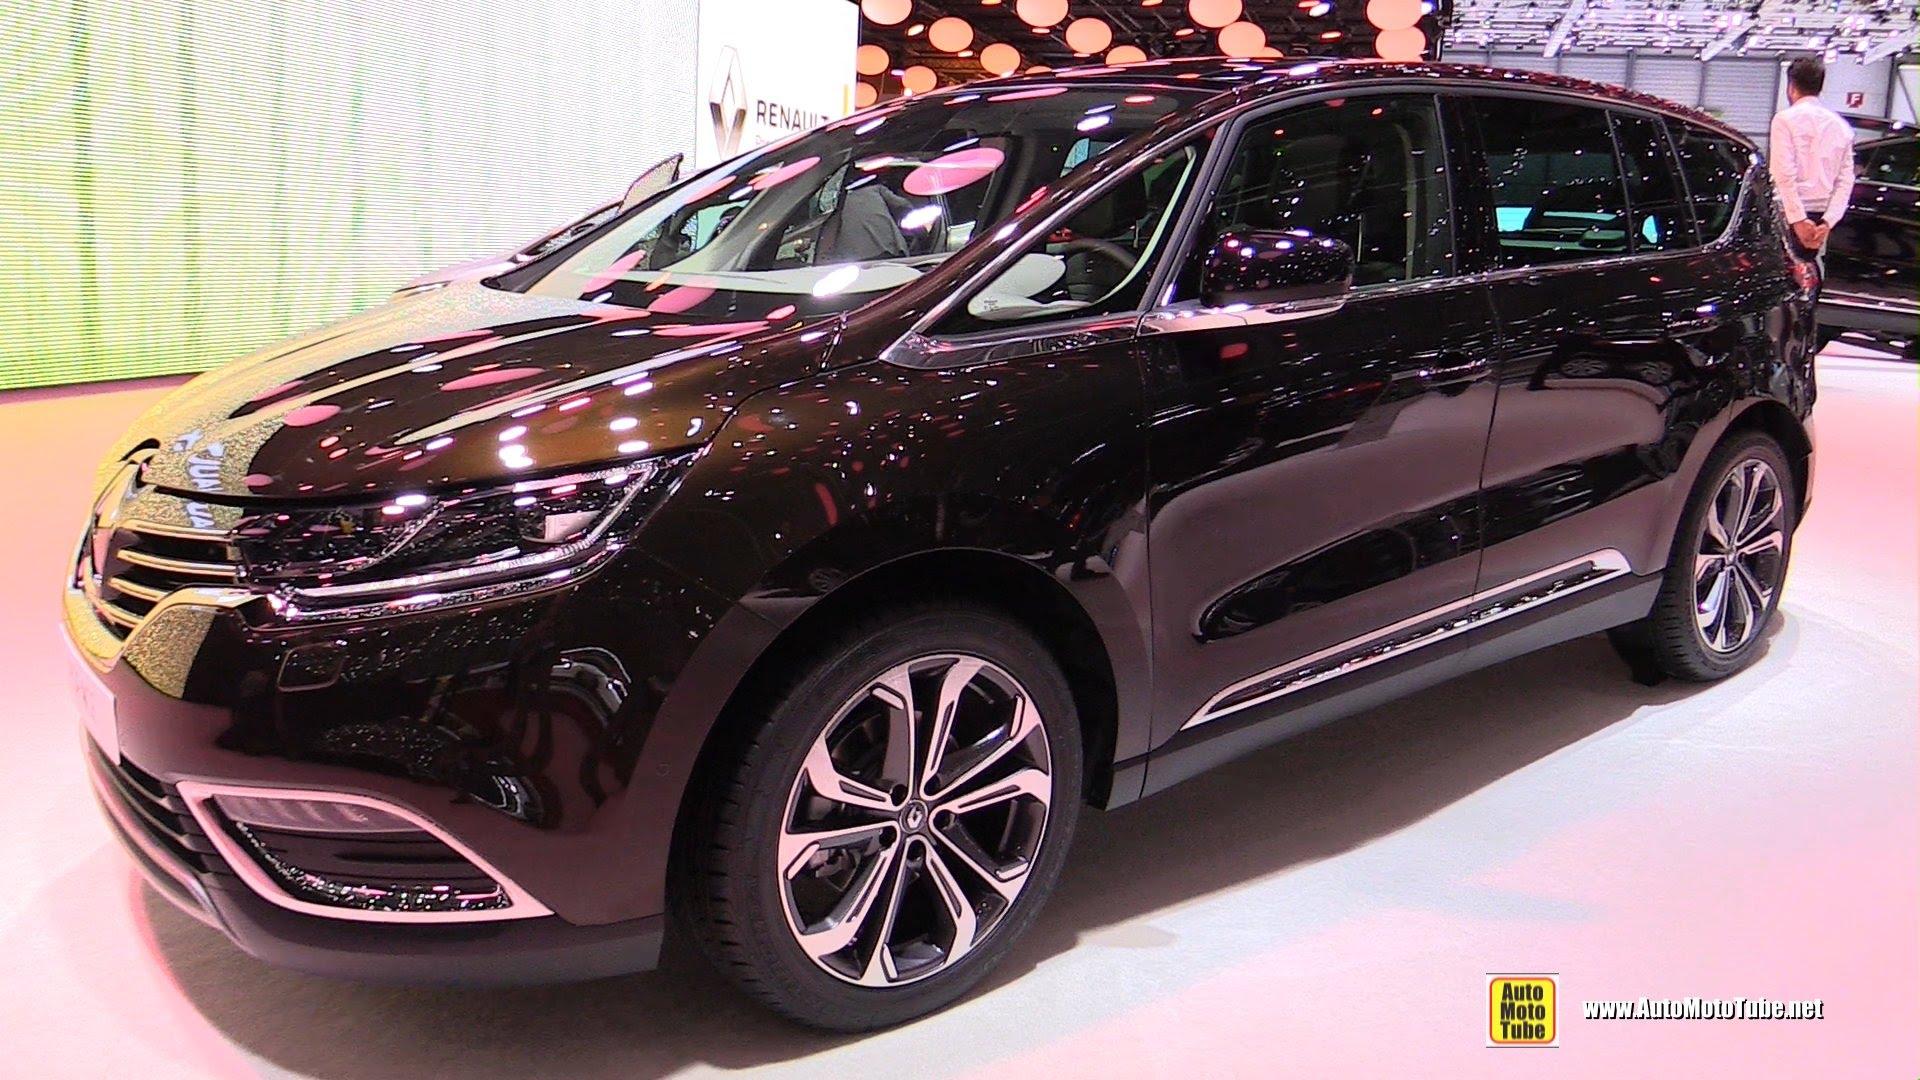 Renault Espace V 2015 - now Minivan #1